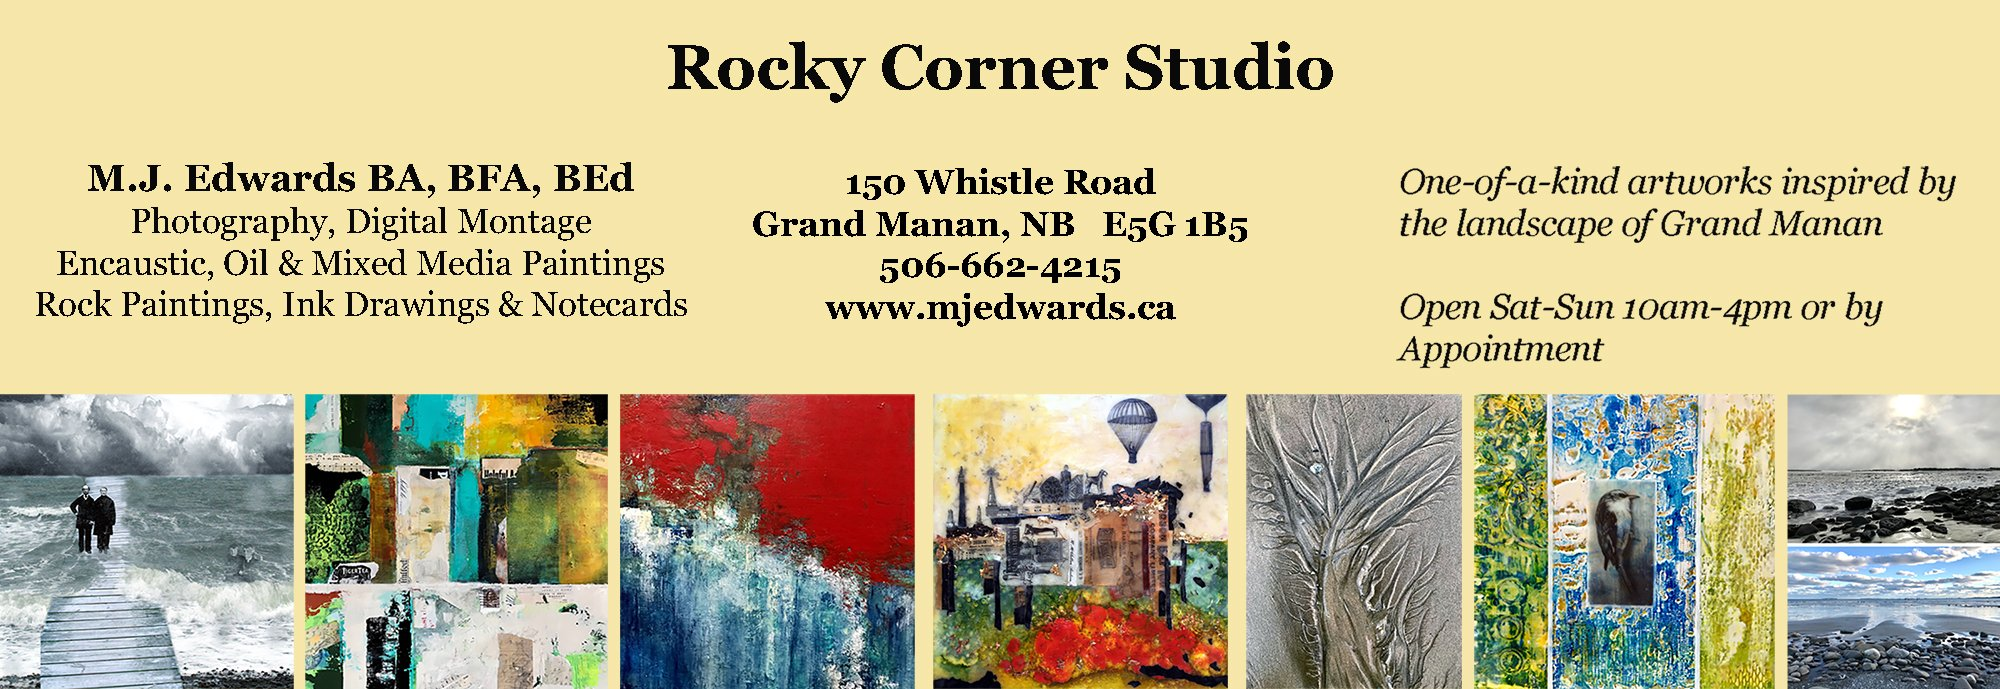 Rocky Corner Studio Artwork by M.J. Edwards